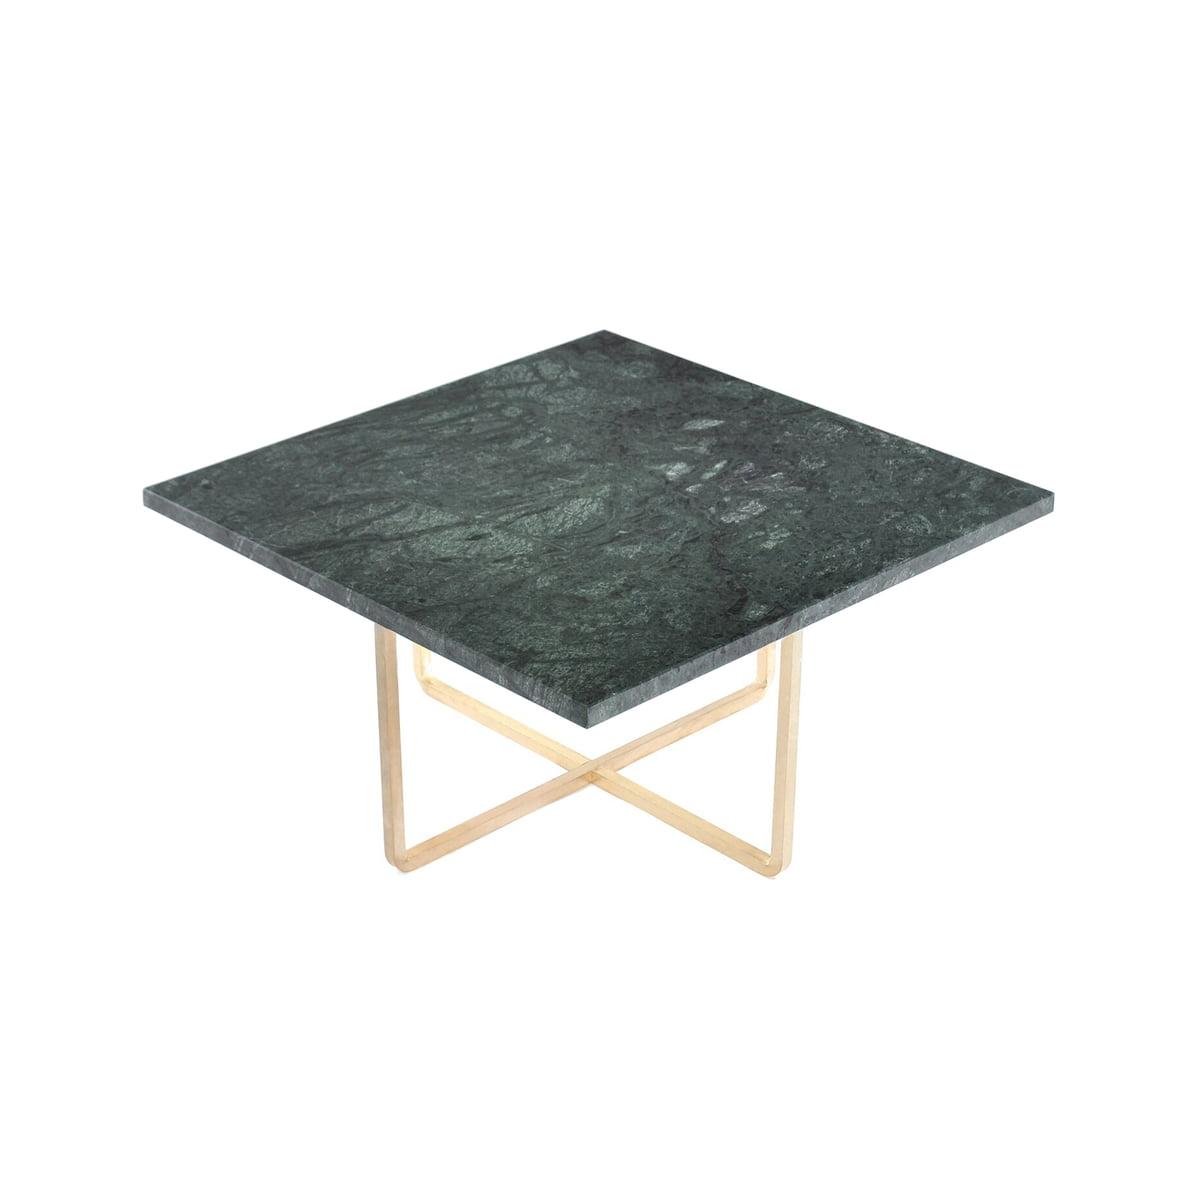 Ox denmarq ninety table 60 x 60 cm messing marmor gruen